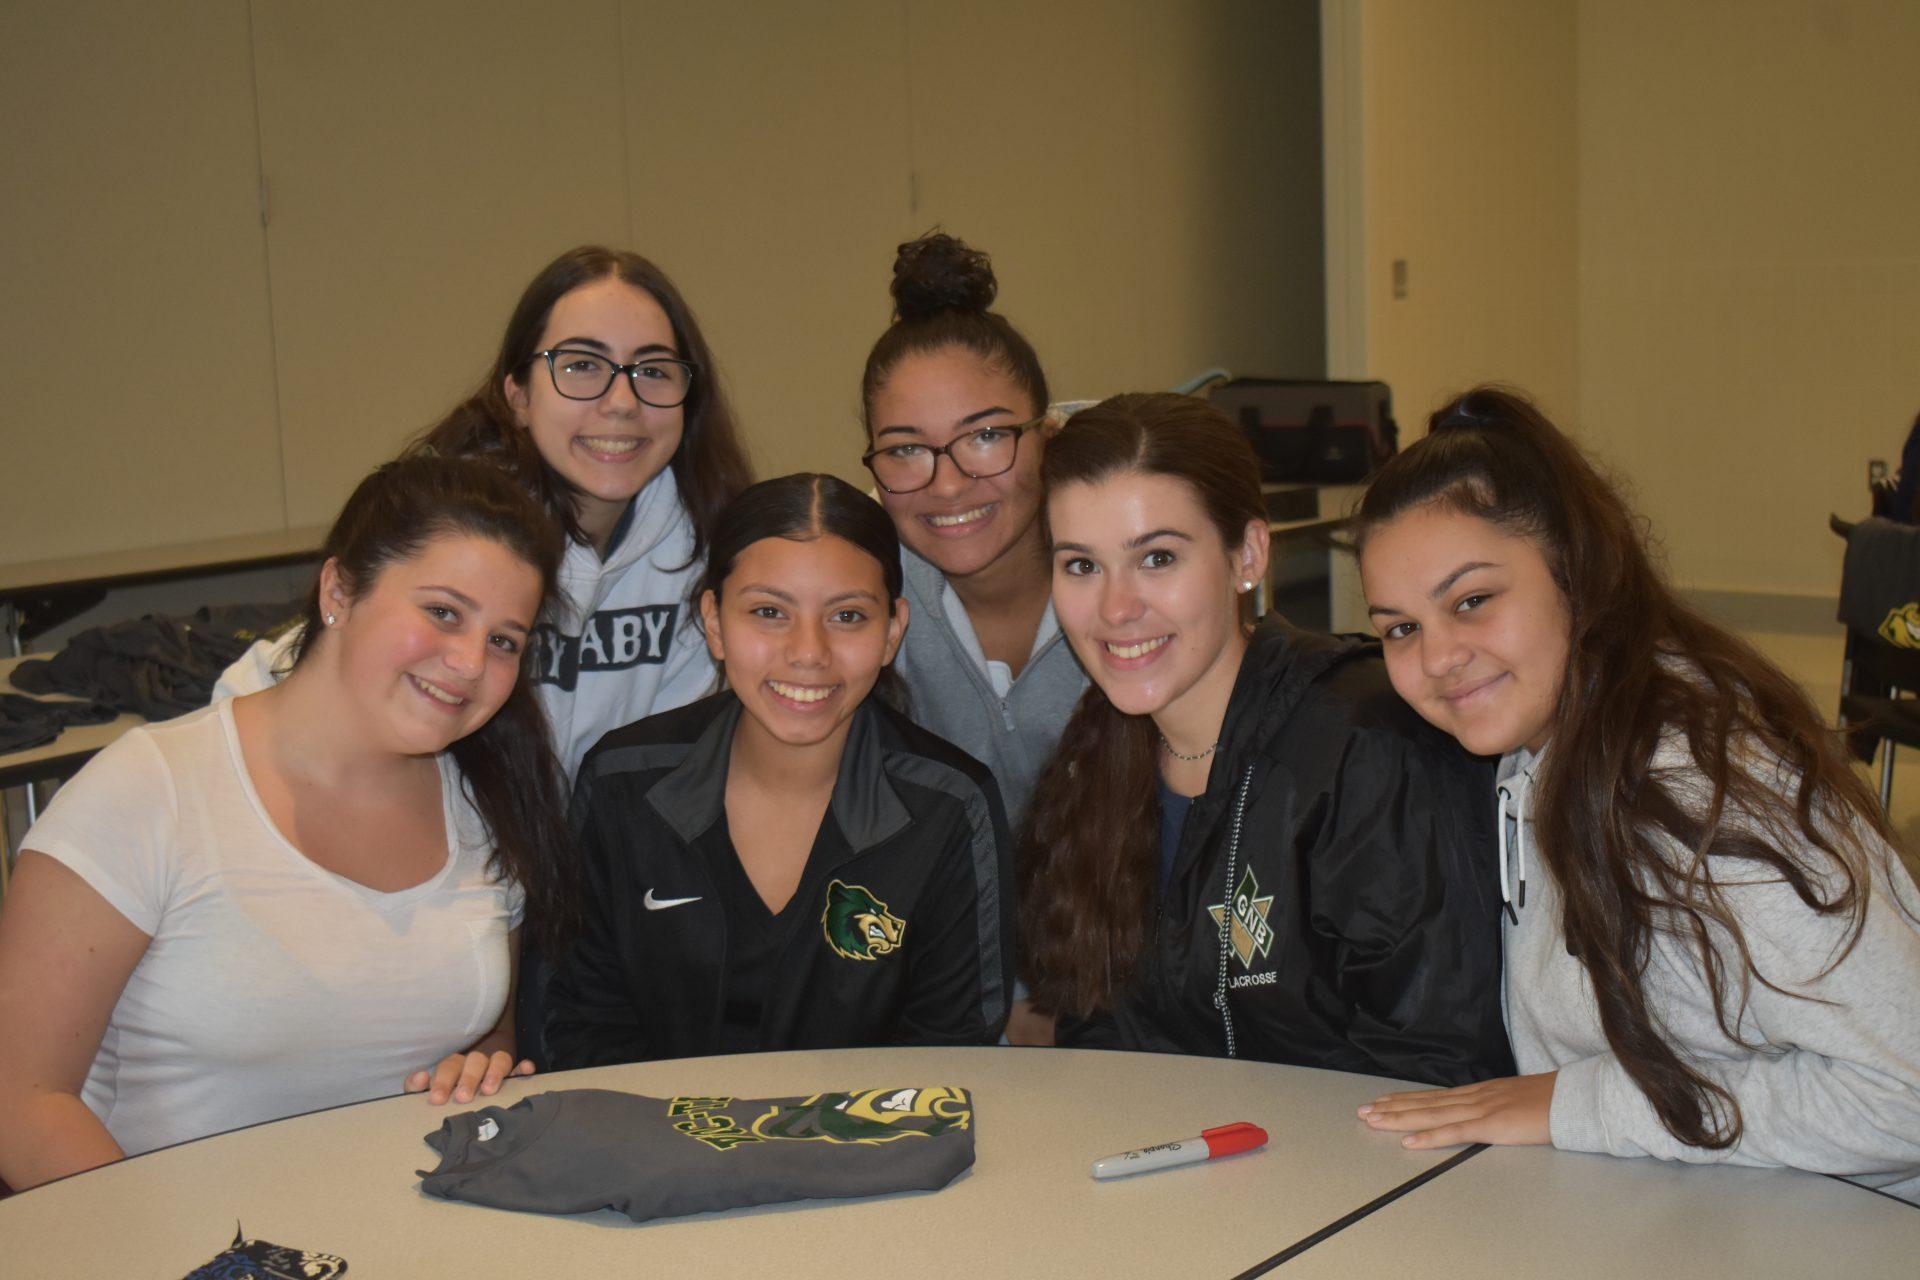 Mentors and Mentees group photo